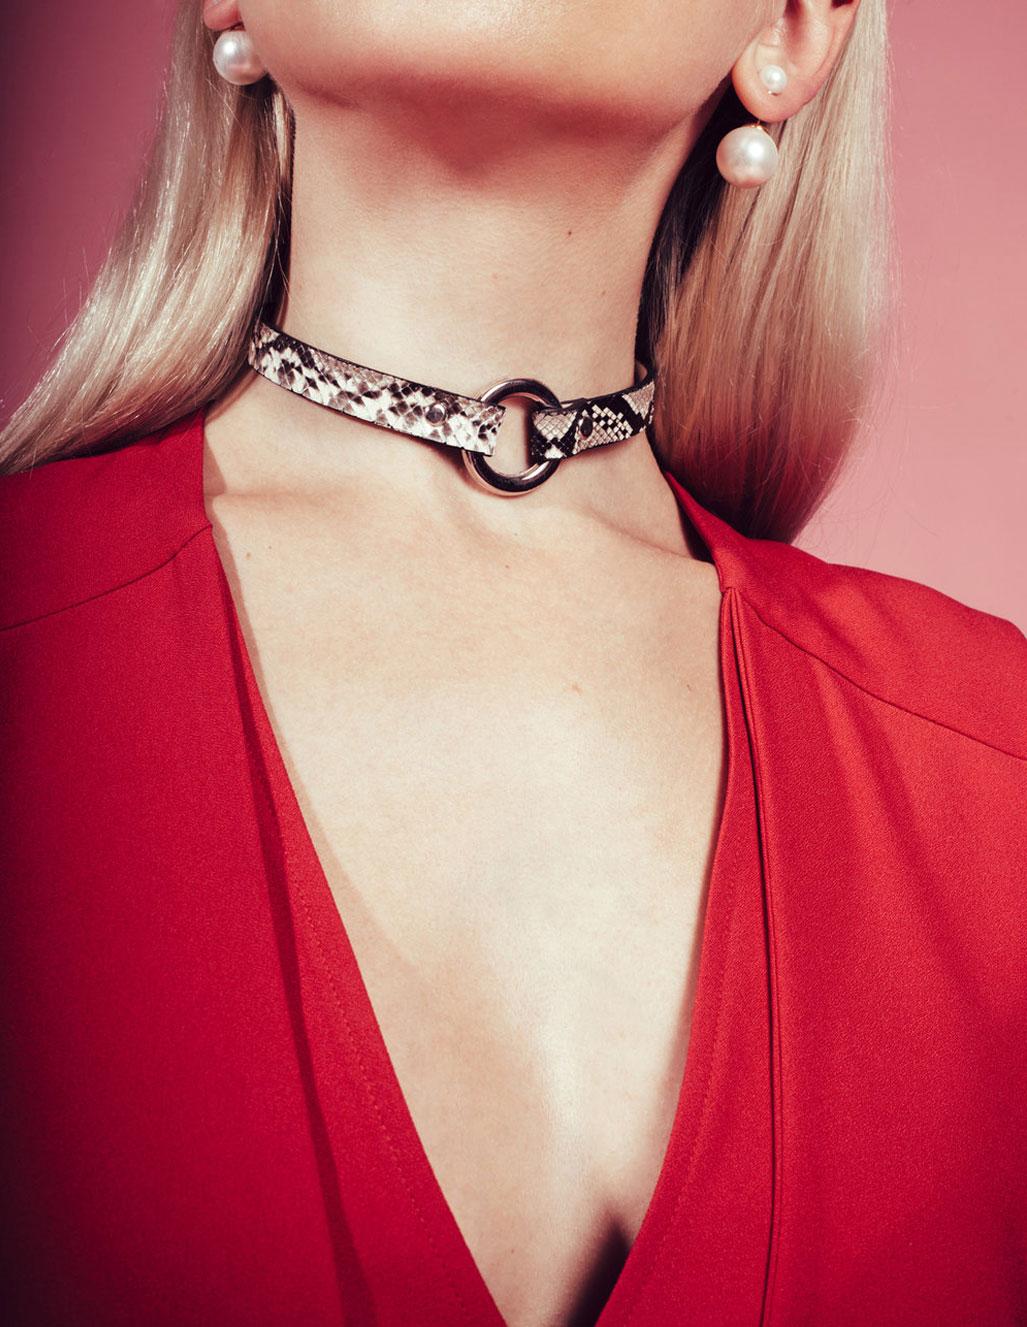 Светлана Легун в рекламной кампании Wicca collection 2016 / фото 08